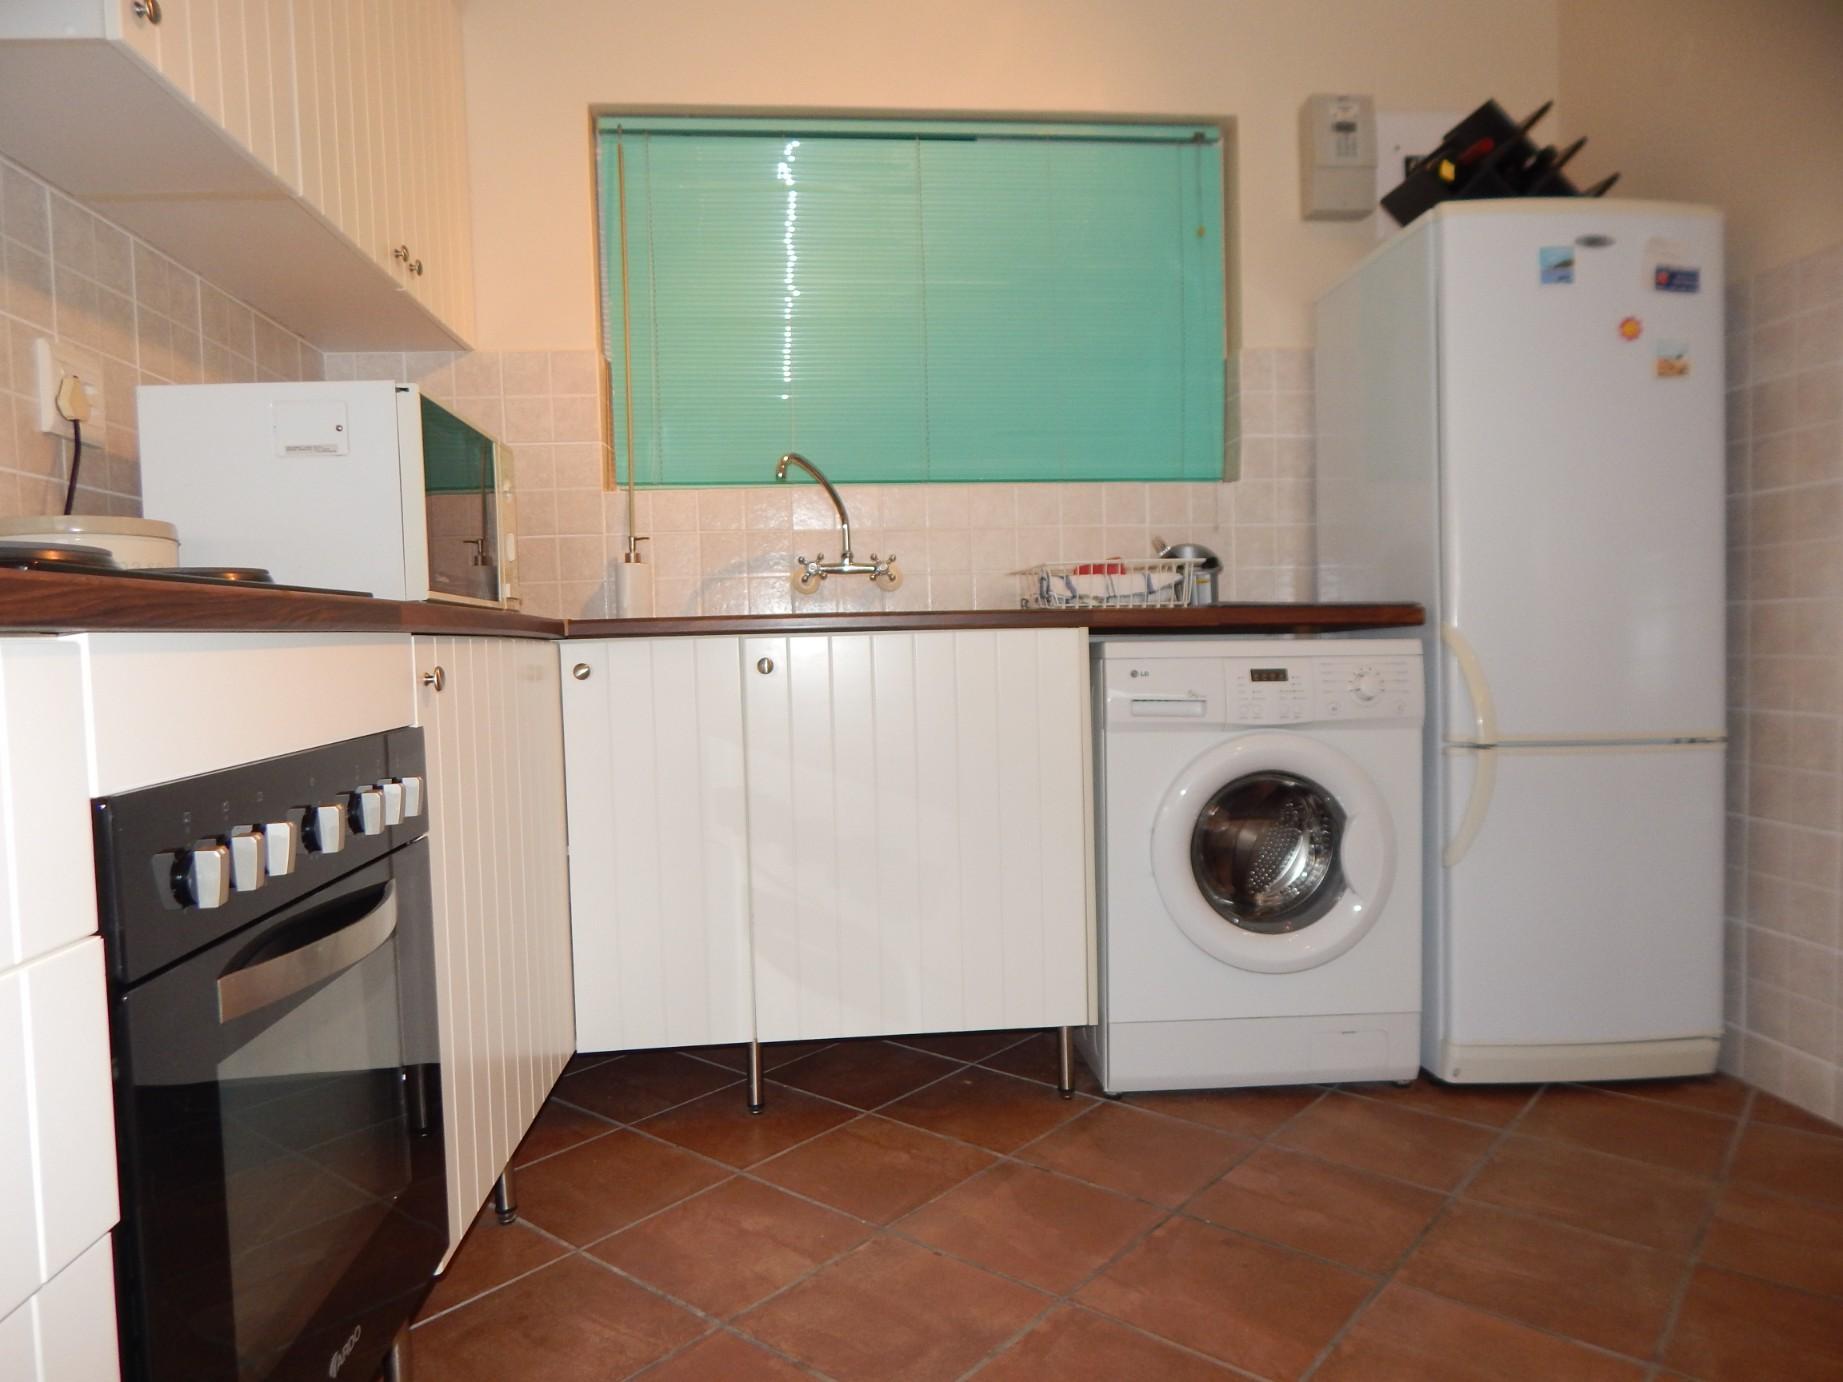 3 Bedroom Apartment for sale in De Bakke ENT0066483 : photo#10